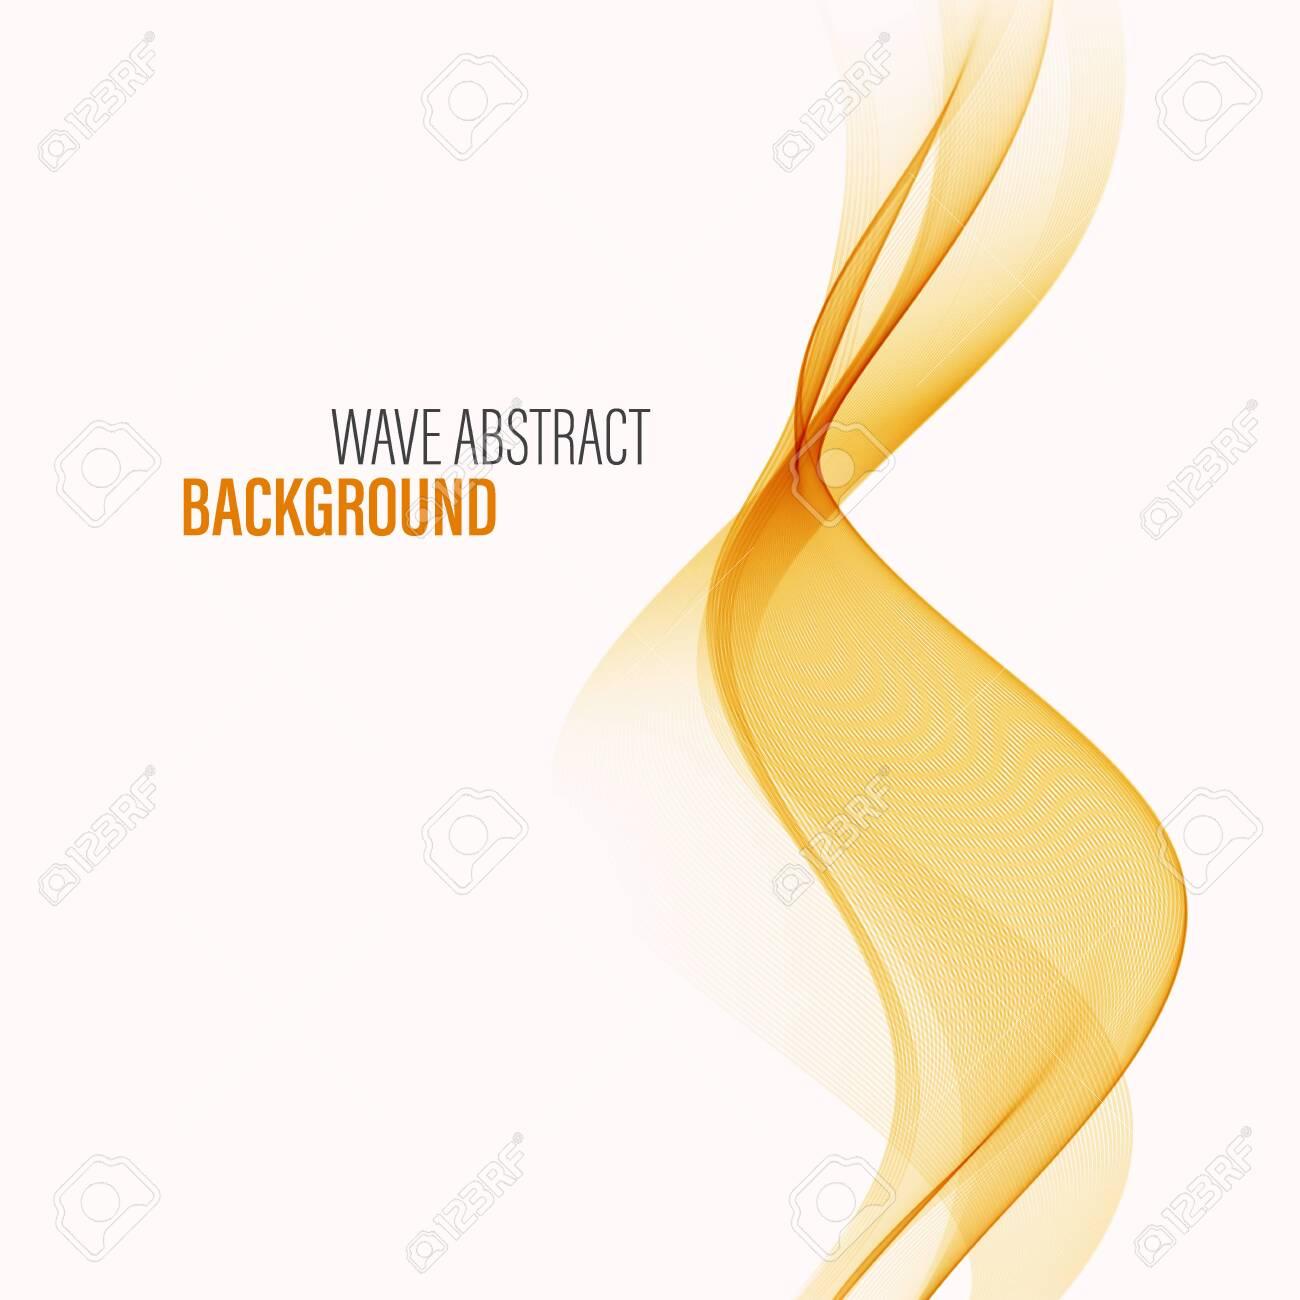 Wavy orange background Wave flow Abstract background - 148183498